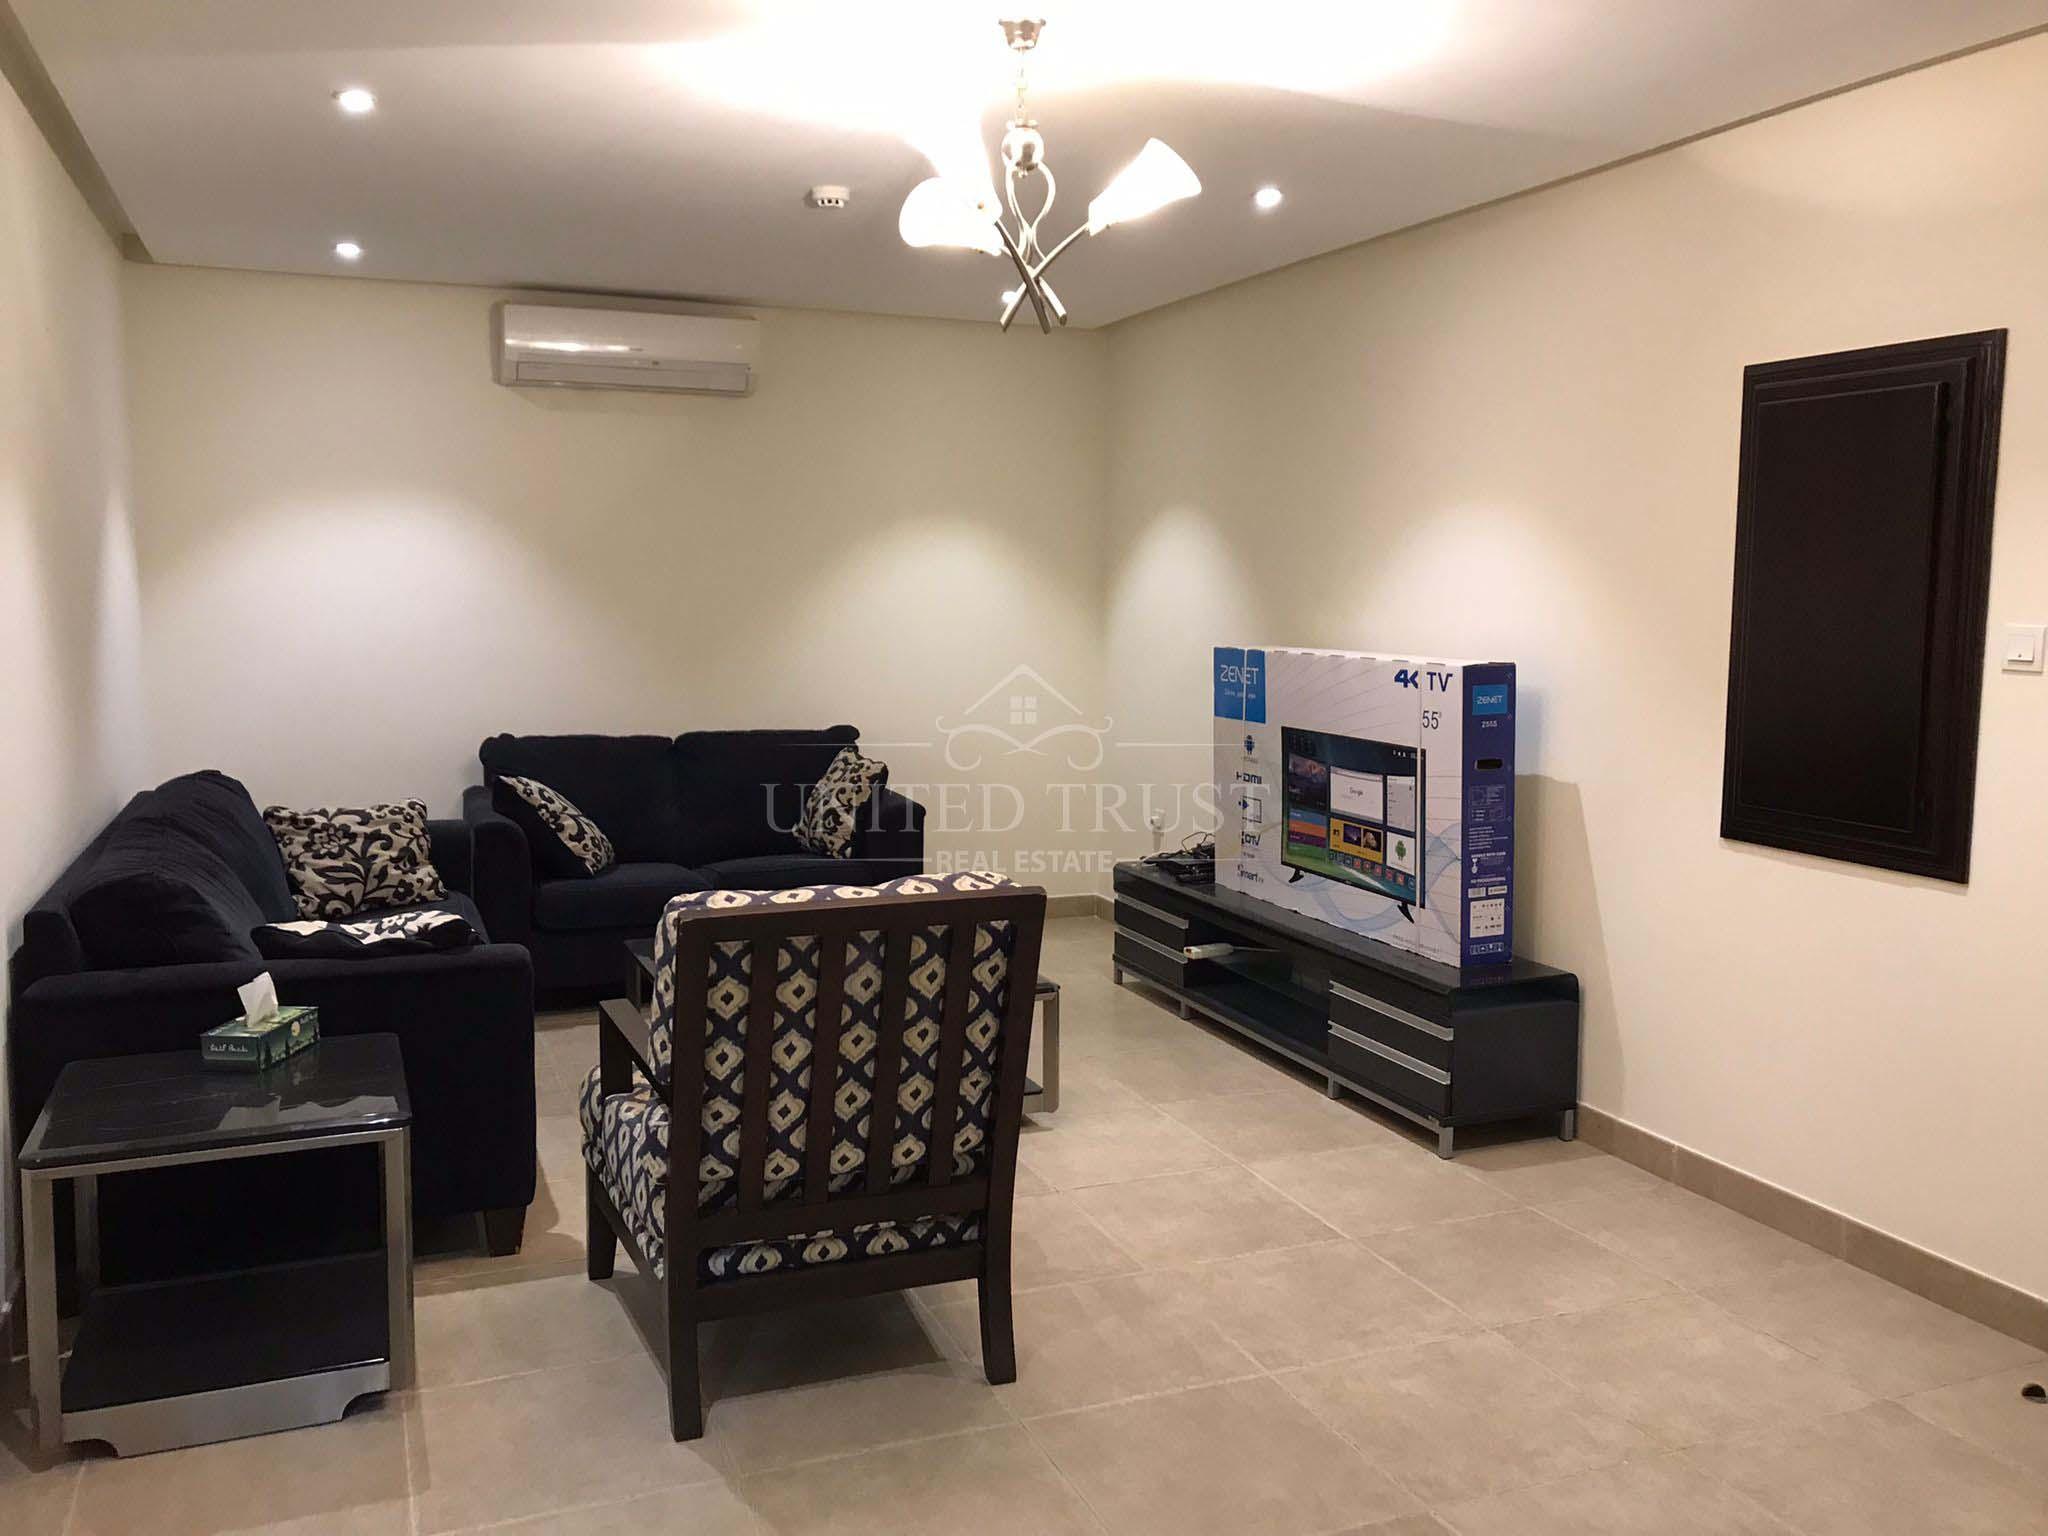 For rent a furnished 1 bedroom flat in Tubli Ref: TUB-AZ-032